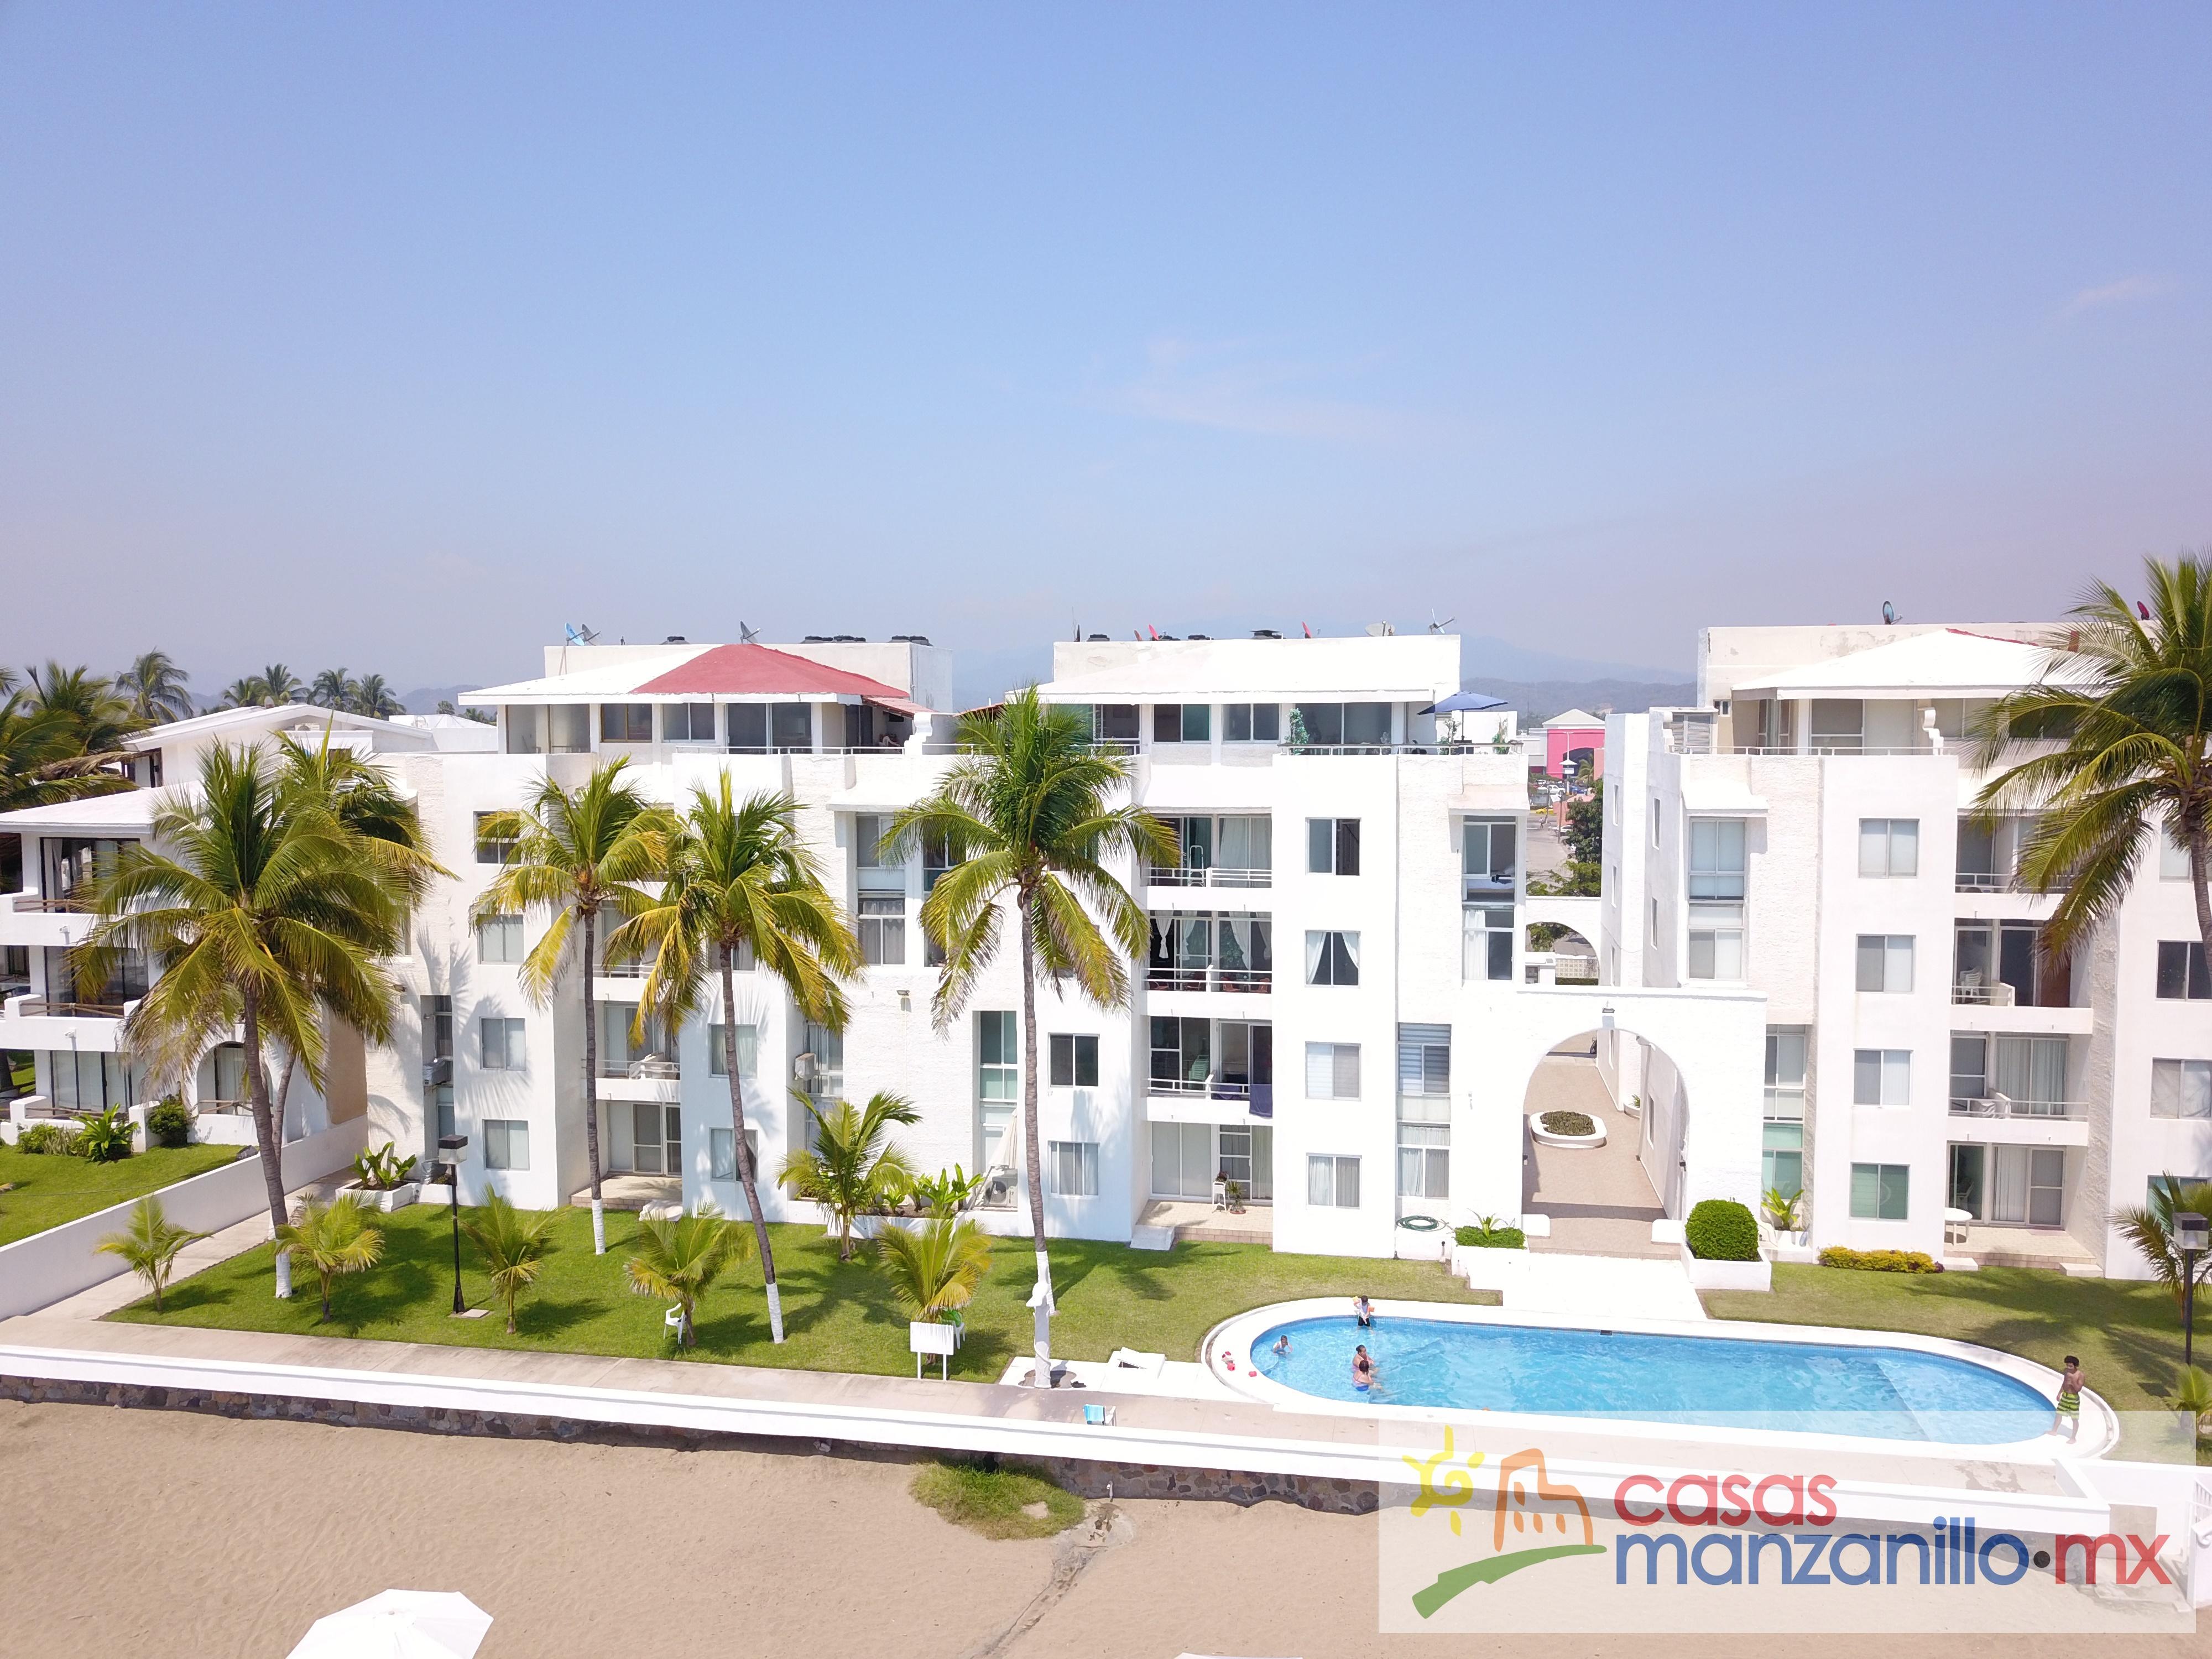 Departamentos RENTA Manzanillo  (7)